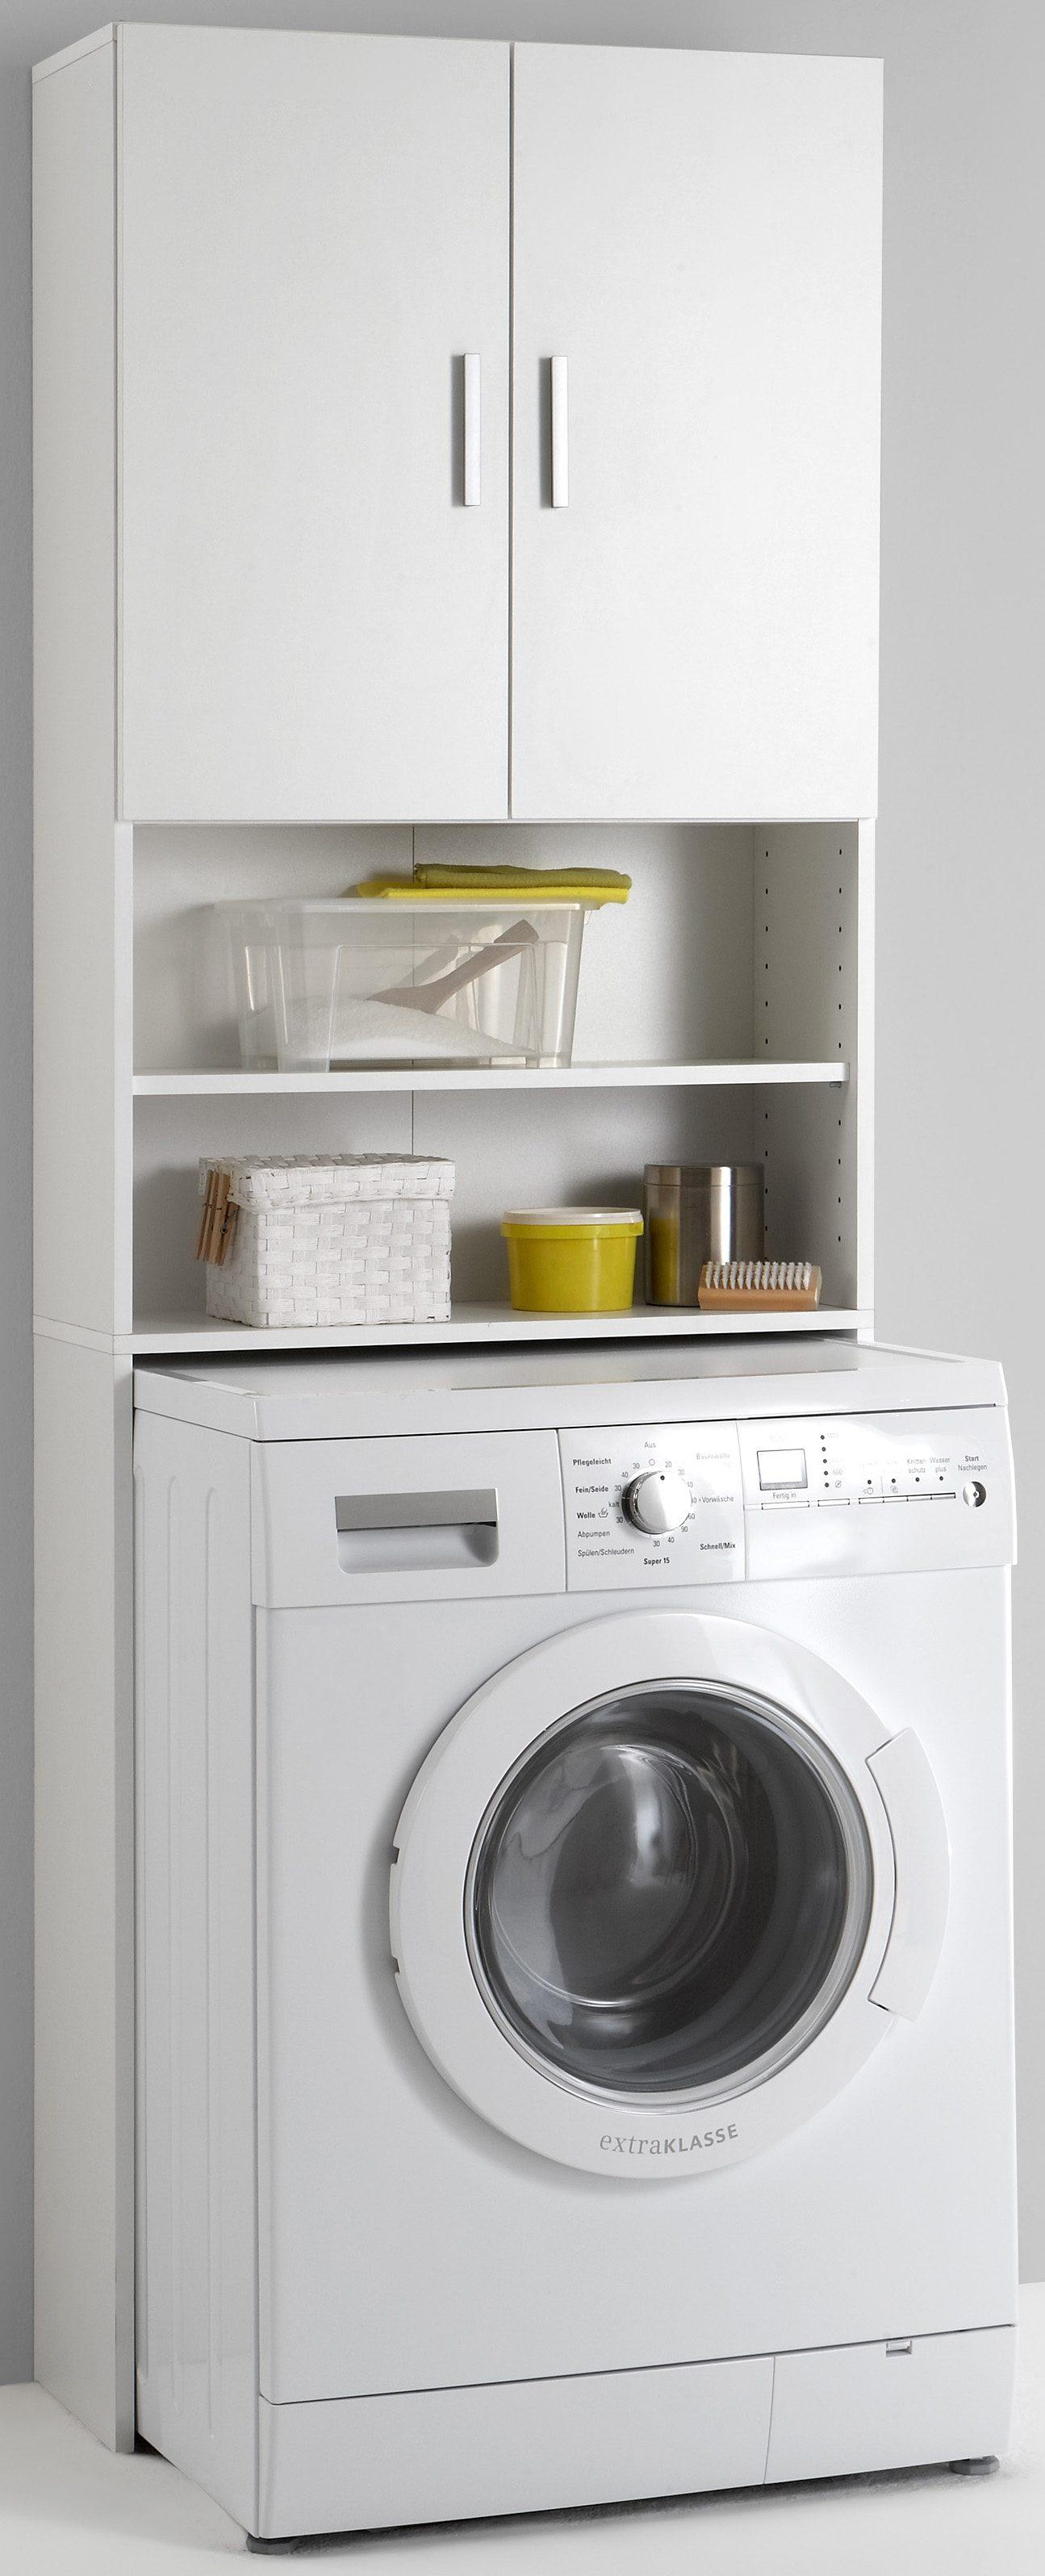 Wasmachine In Badkamer : Beste huis ideeën wasmachine aansluiting badkamer huis ideeën